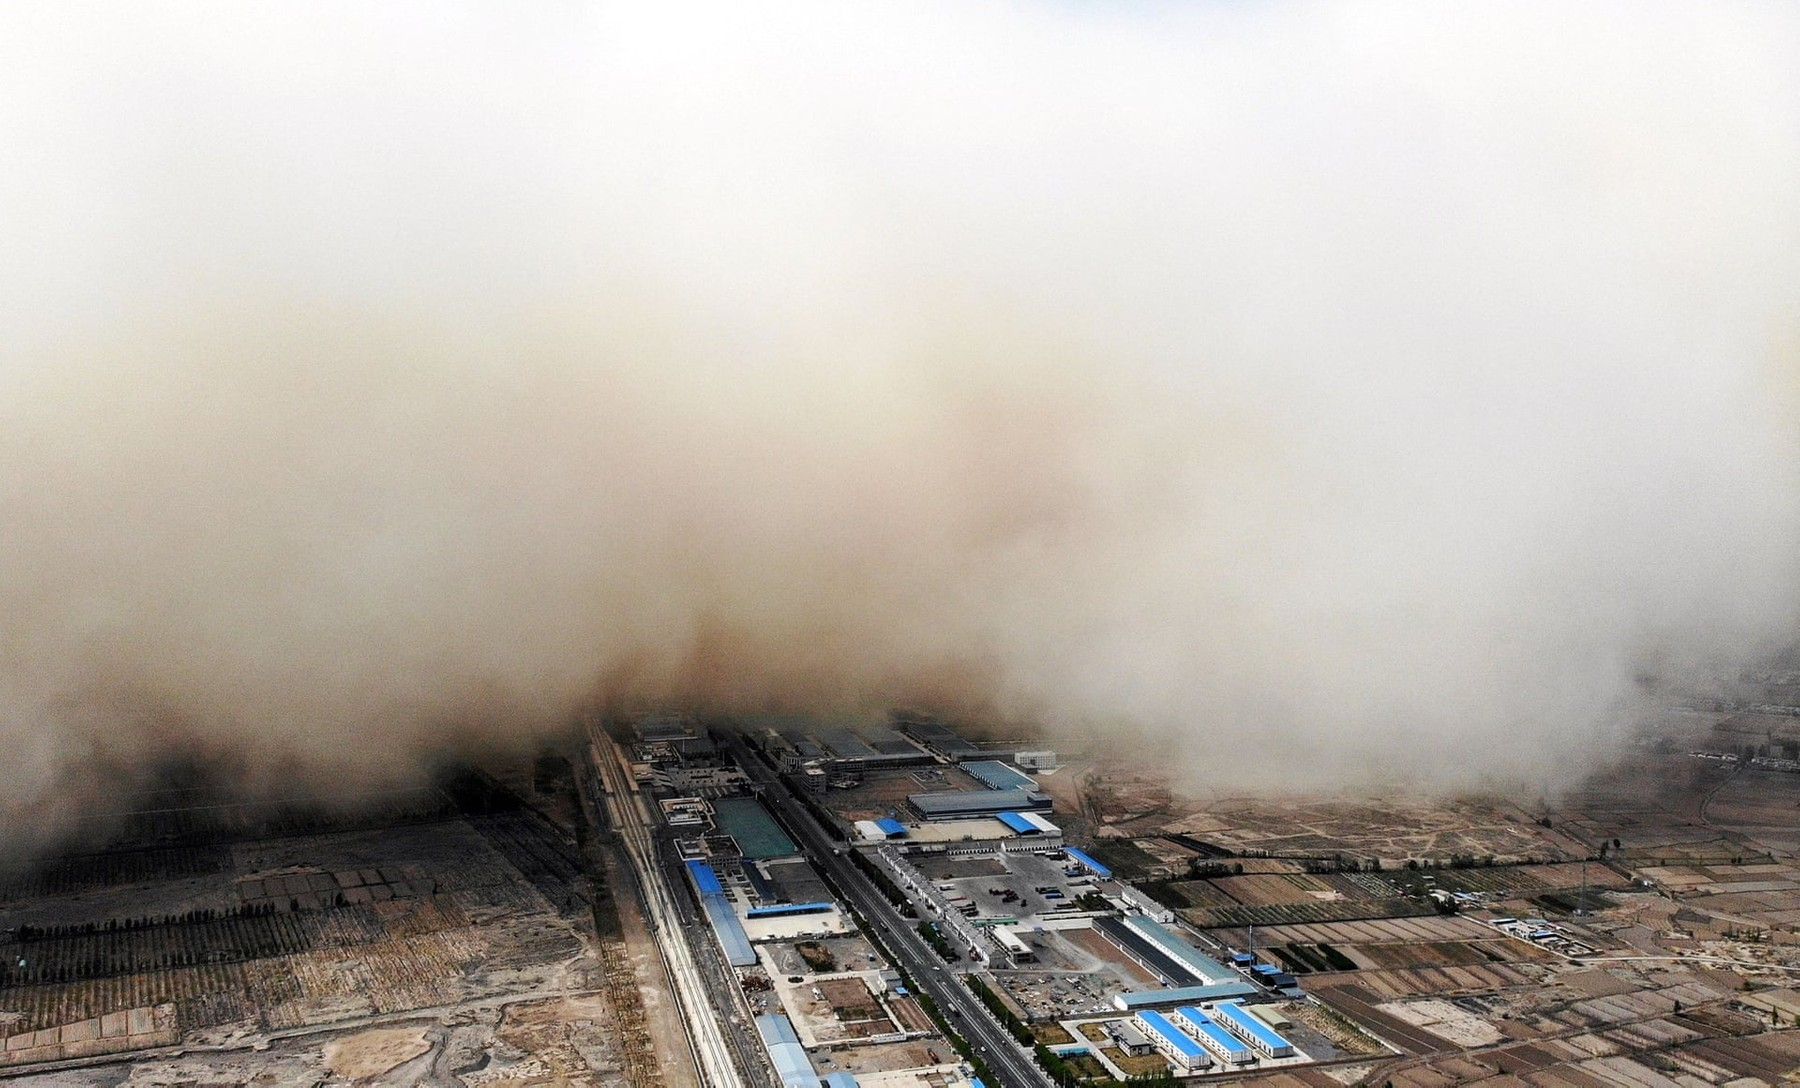 Sandstorm engulfs village in China's Gansu province